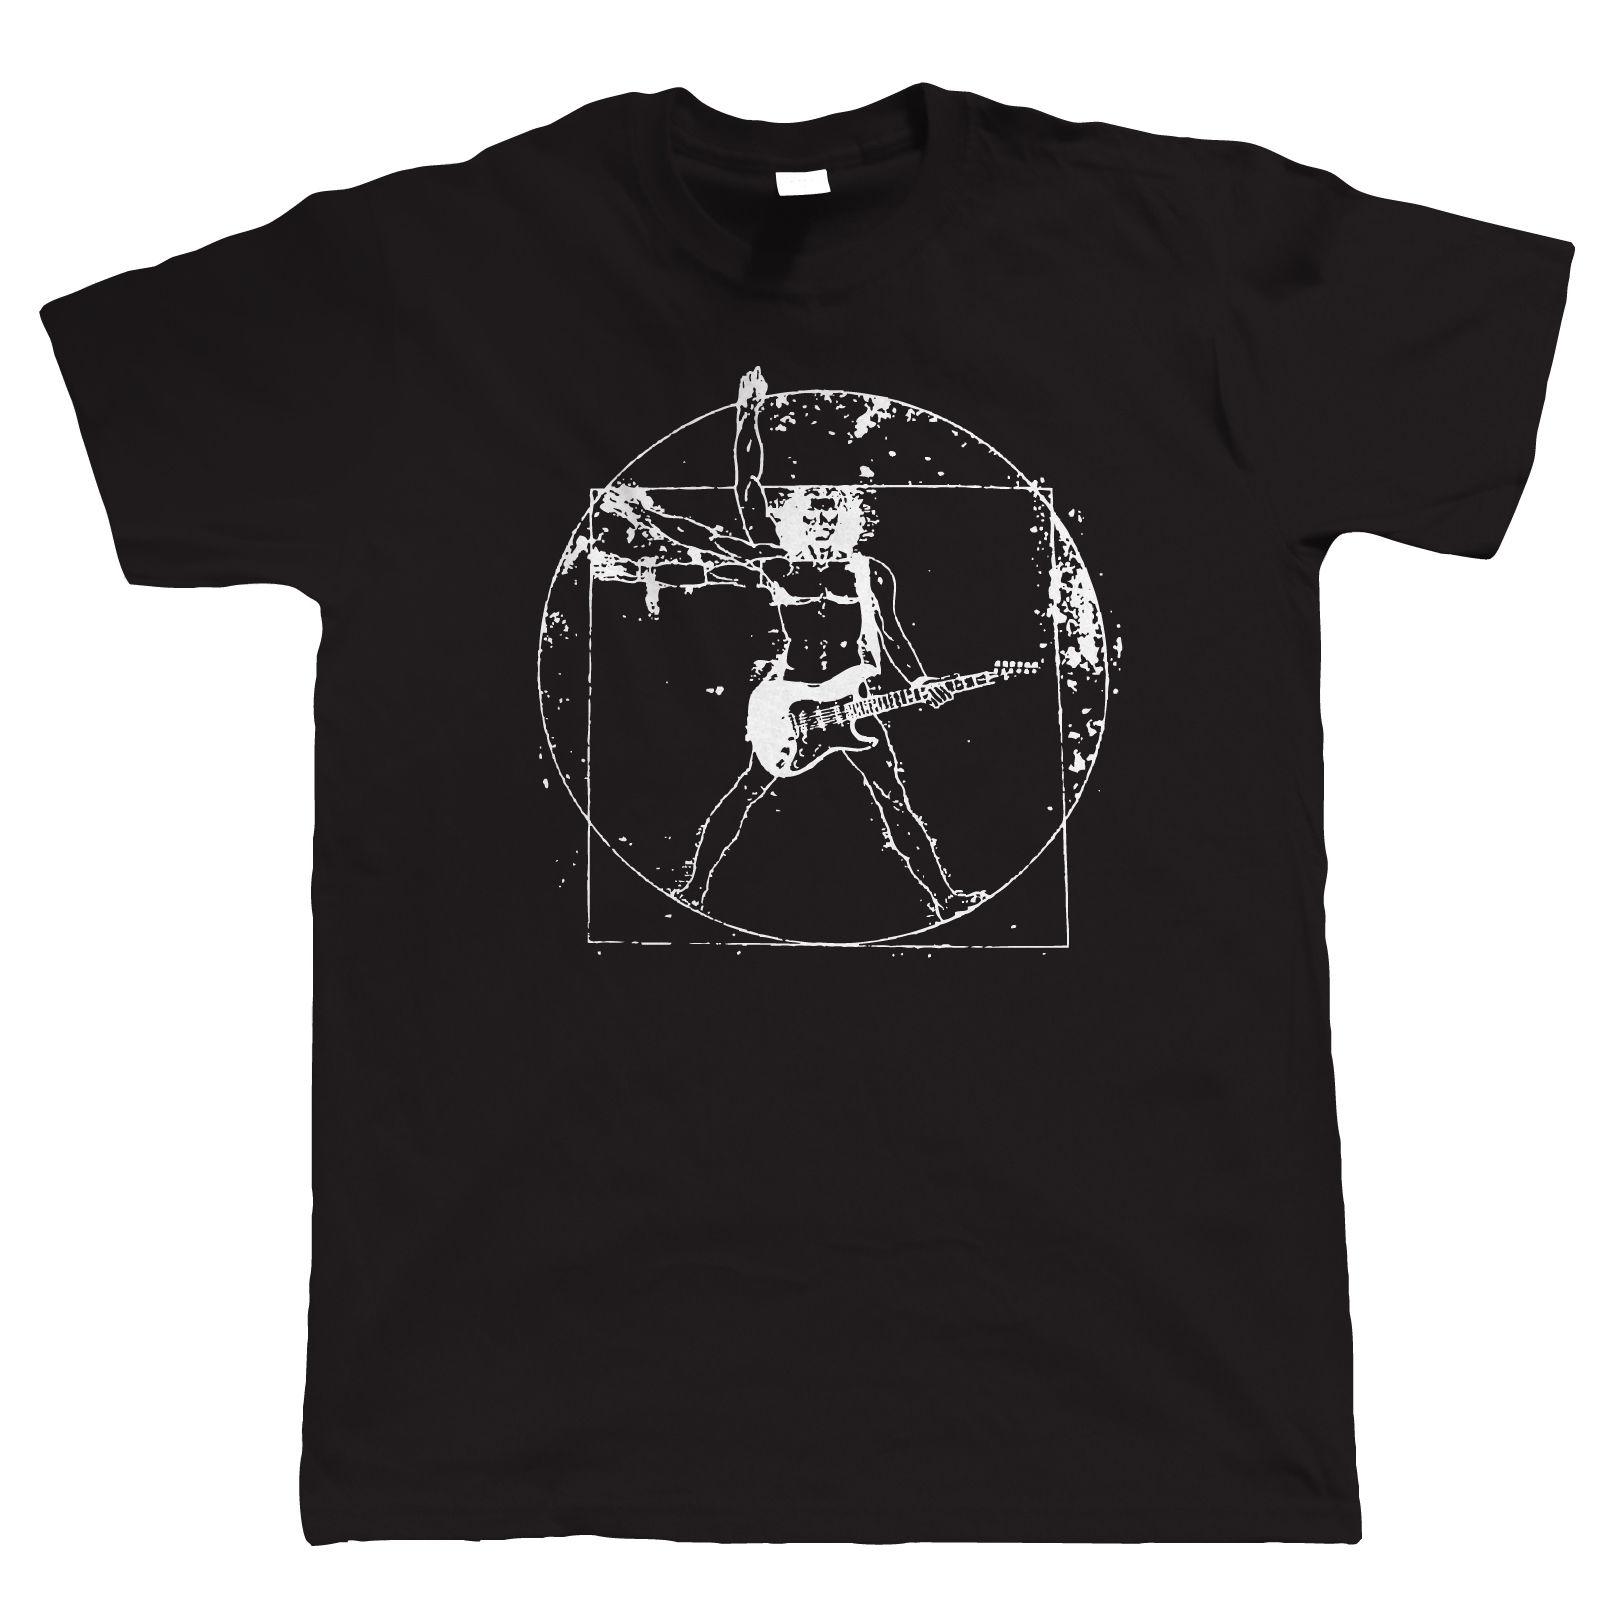 Vitruvian Guitarist, Mens Guitar T Shirt - Birthday Gift for Dad Him